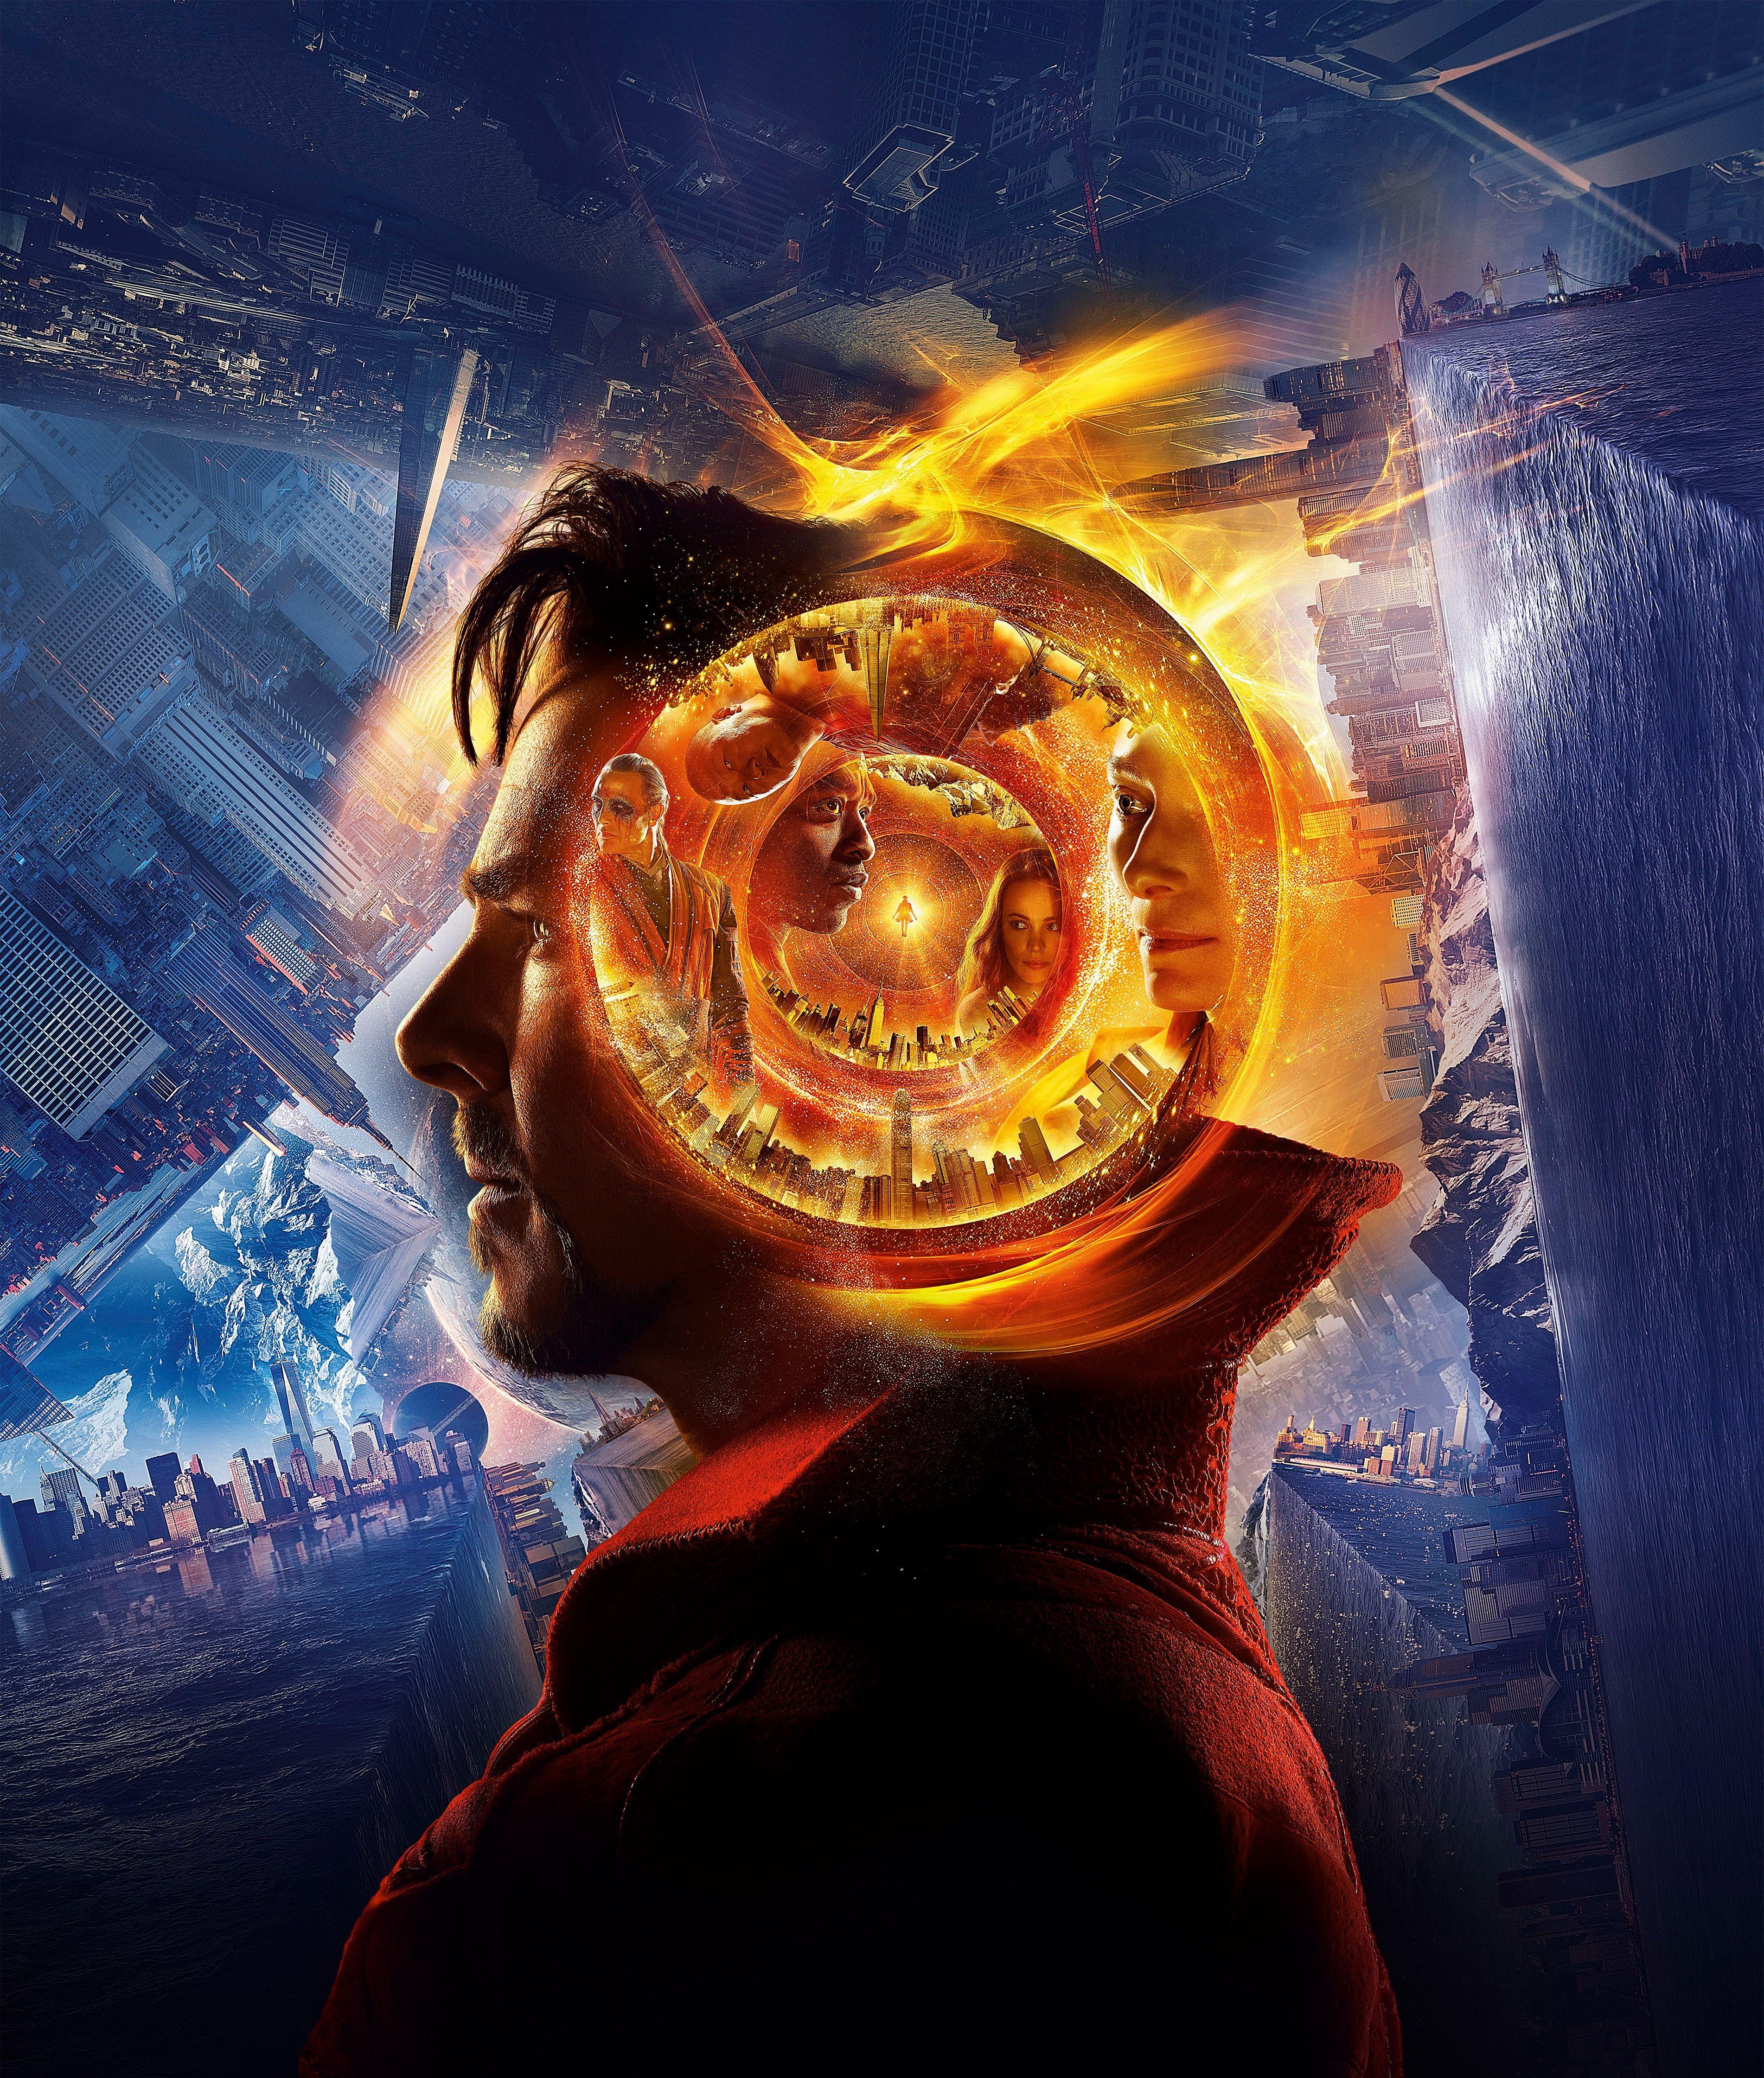 Doctor Strange 4K Wallpapers - Top Free Doctor Strange 4K ...